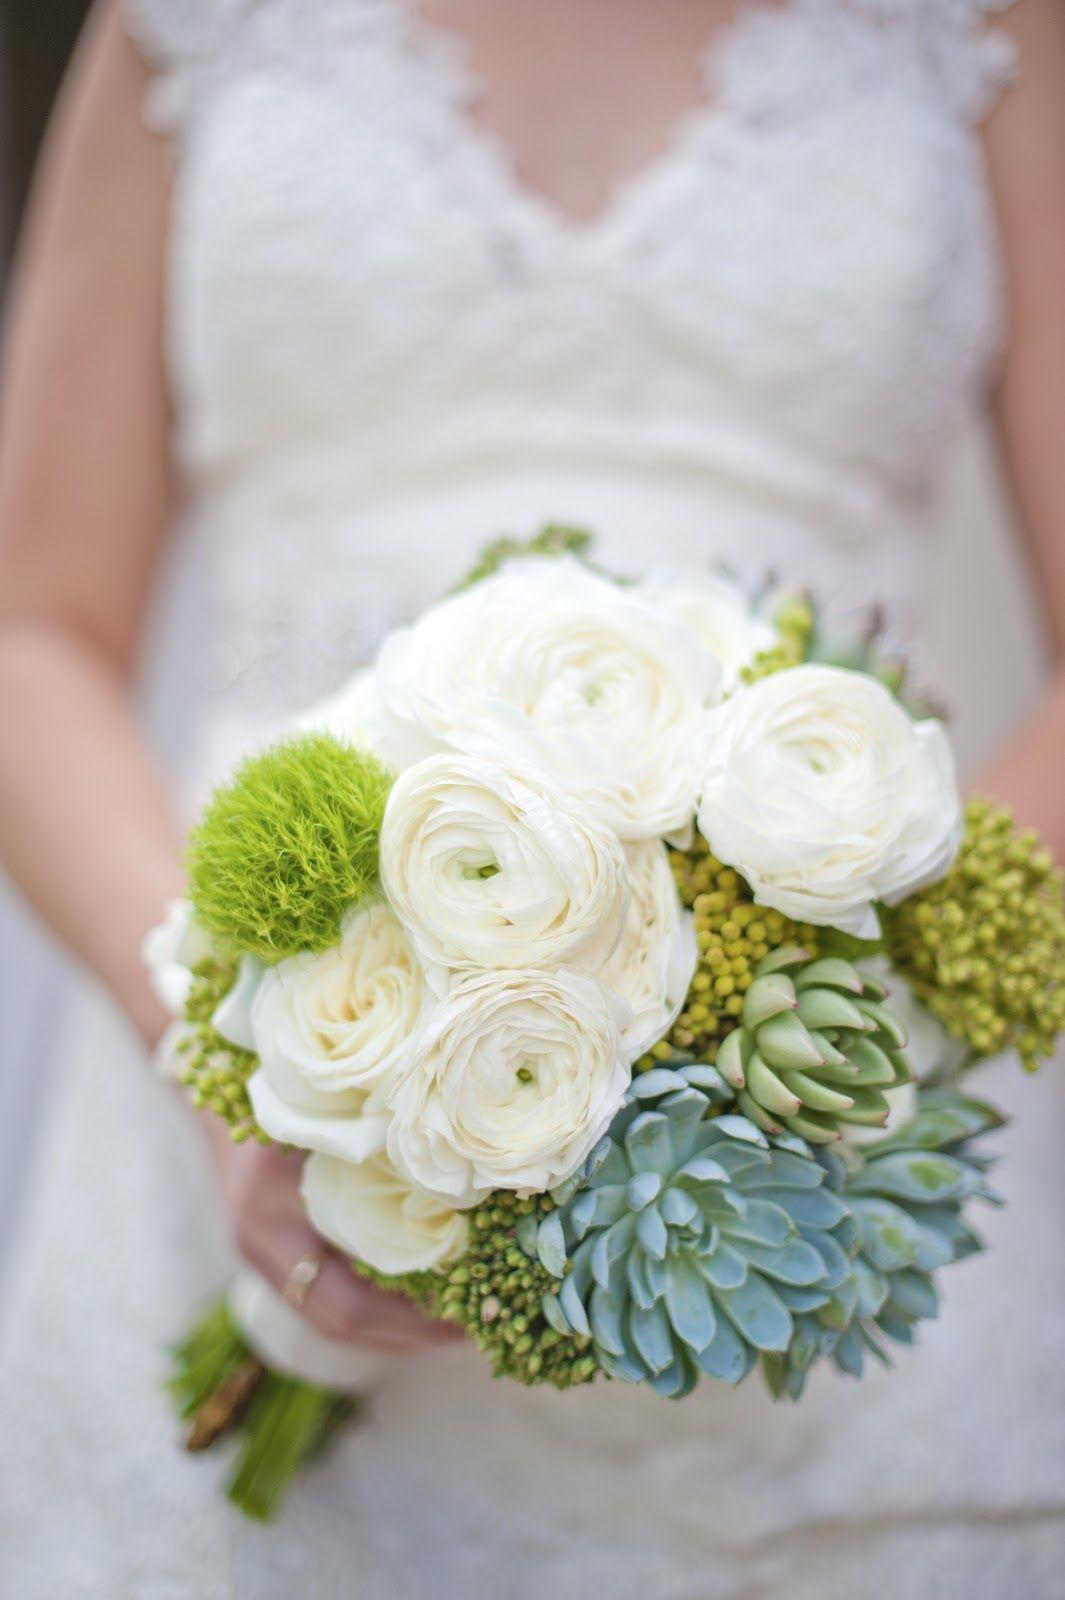 Modern white green and yellow wedding bouquet with succulents modern white green and yellow wedding bouquet with succulents floral design munster rose izmirmasajfo